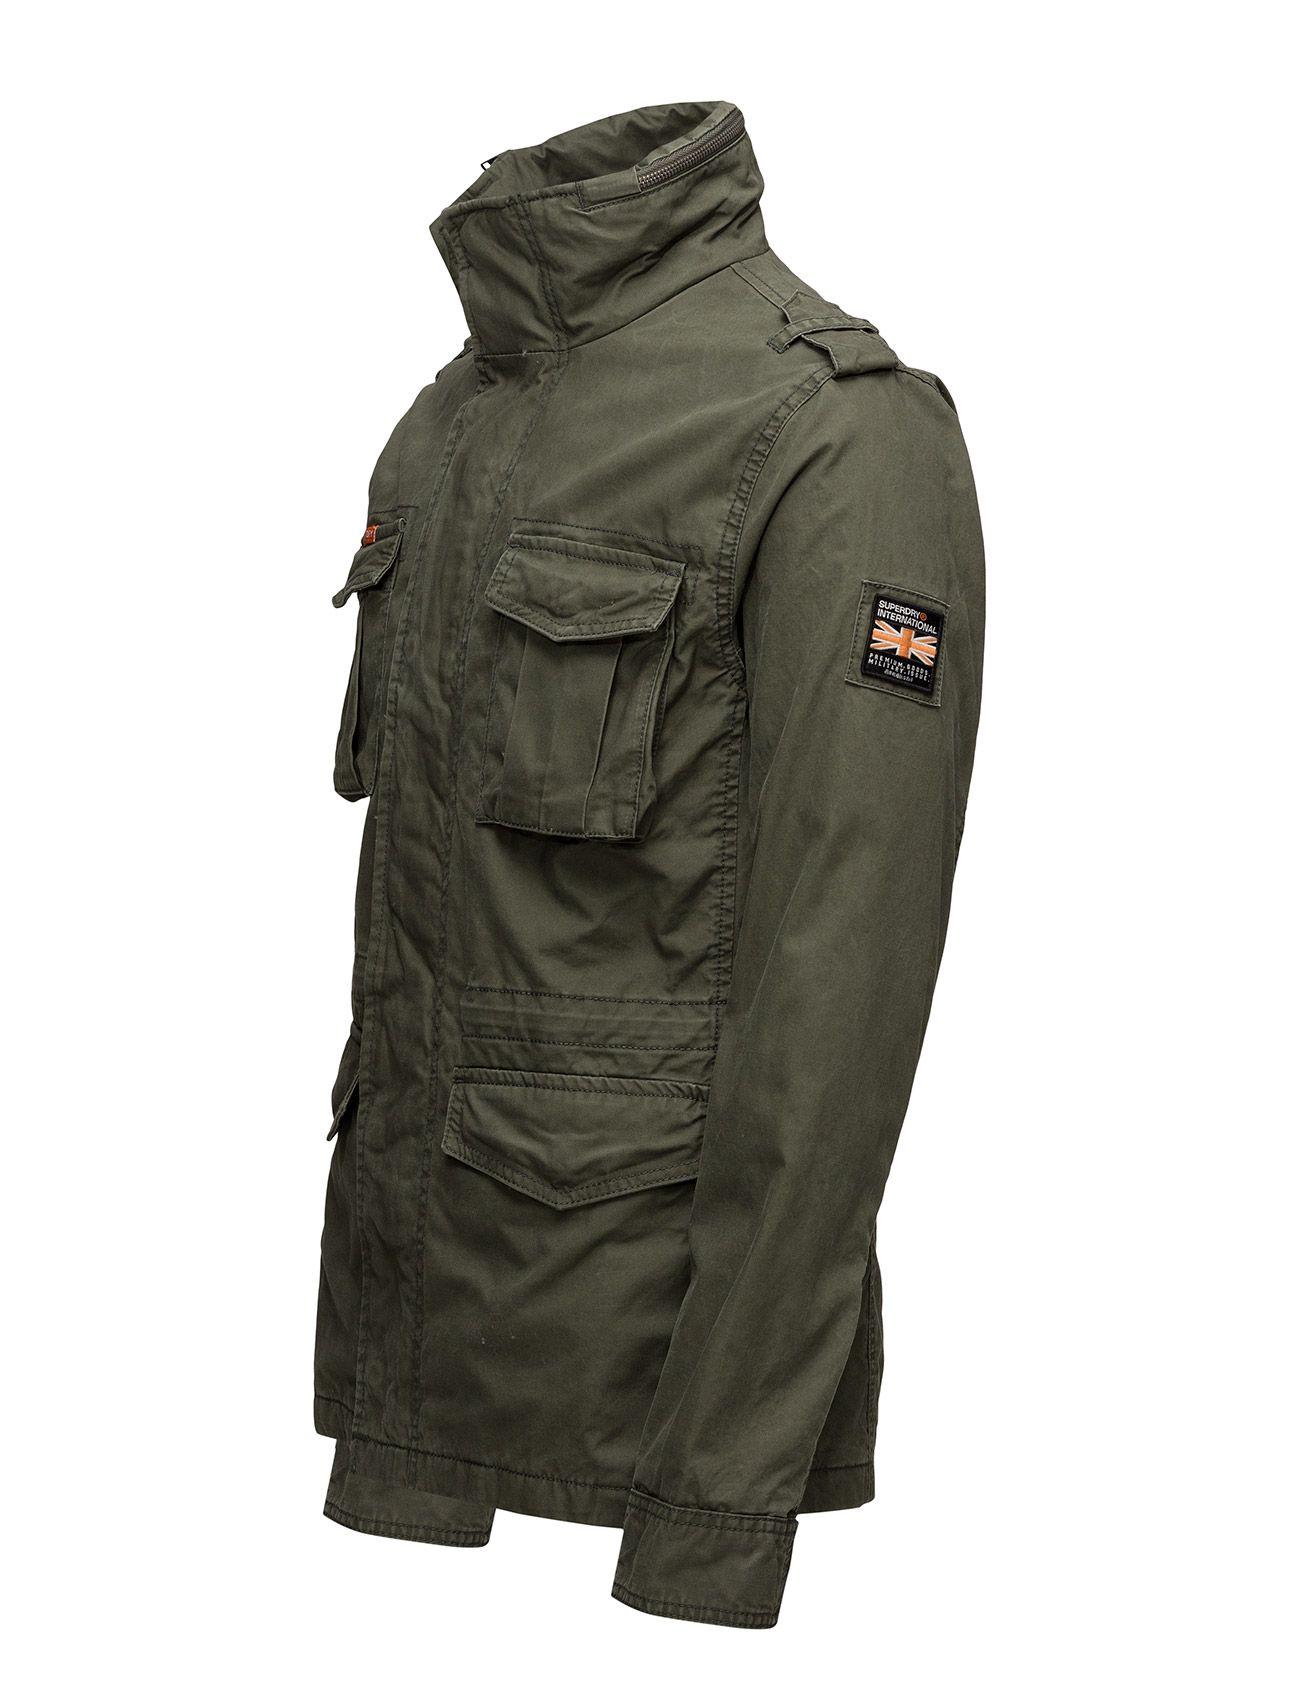 Superdry Classic Rookie Military Jacket Men Clothing Outerwear Jackets Light Patrol Khaki Mens Military Jacket Superdry Jackets Mens Outfits [ 1700 x 1300 Pixel ]